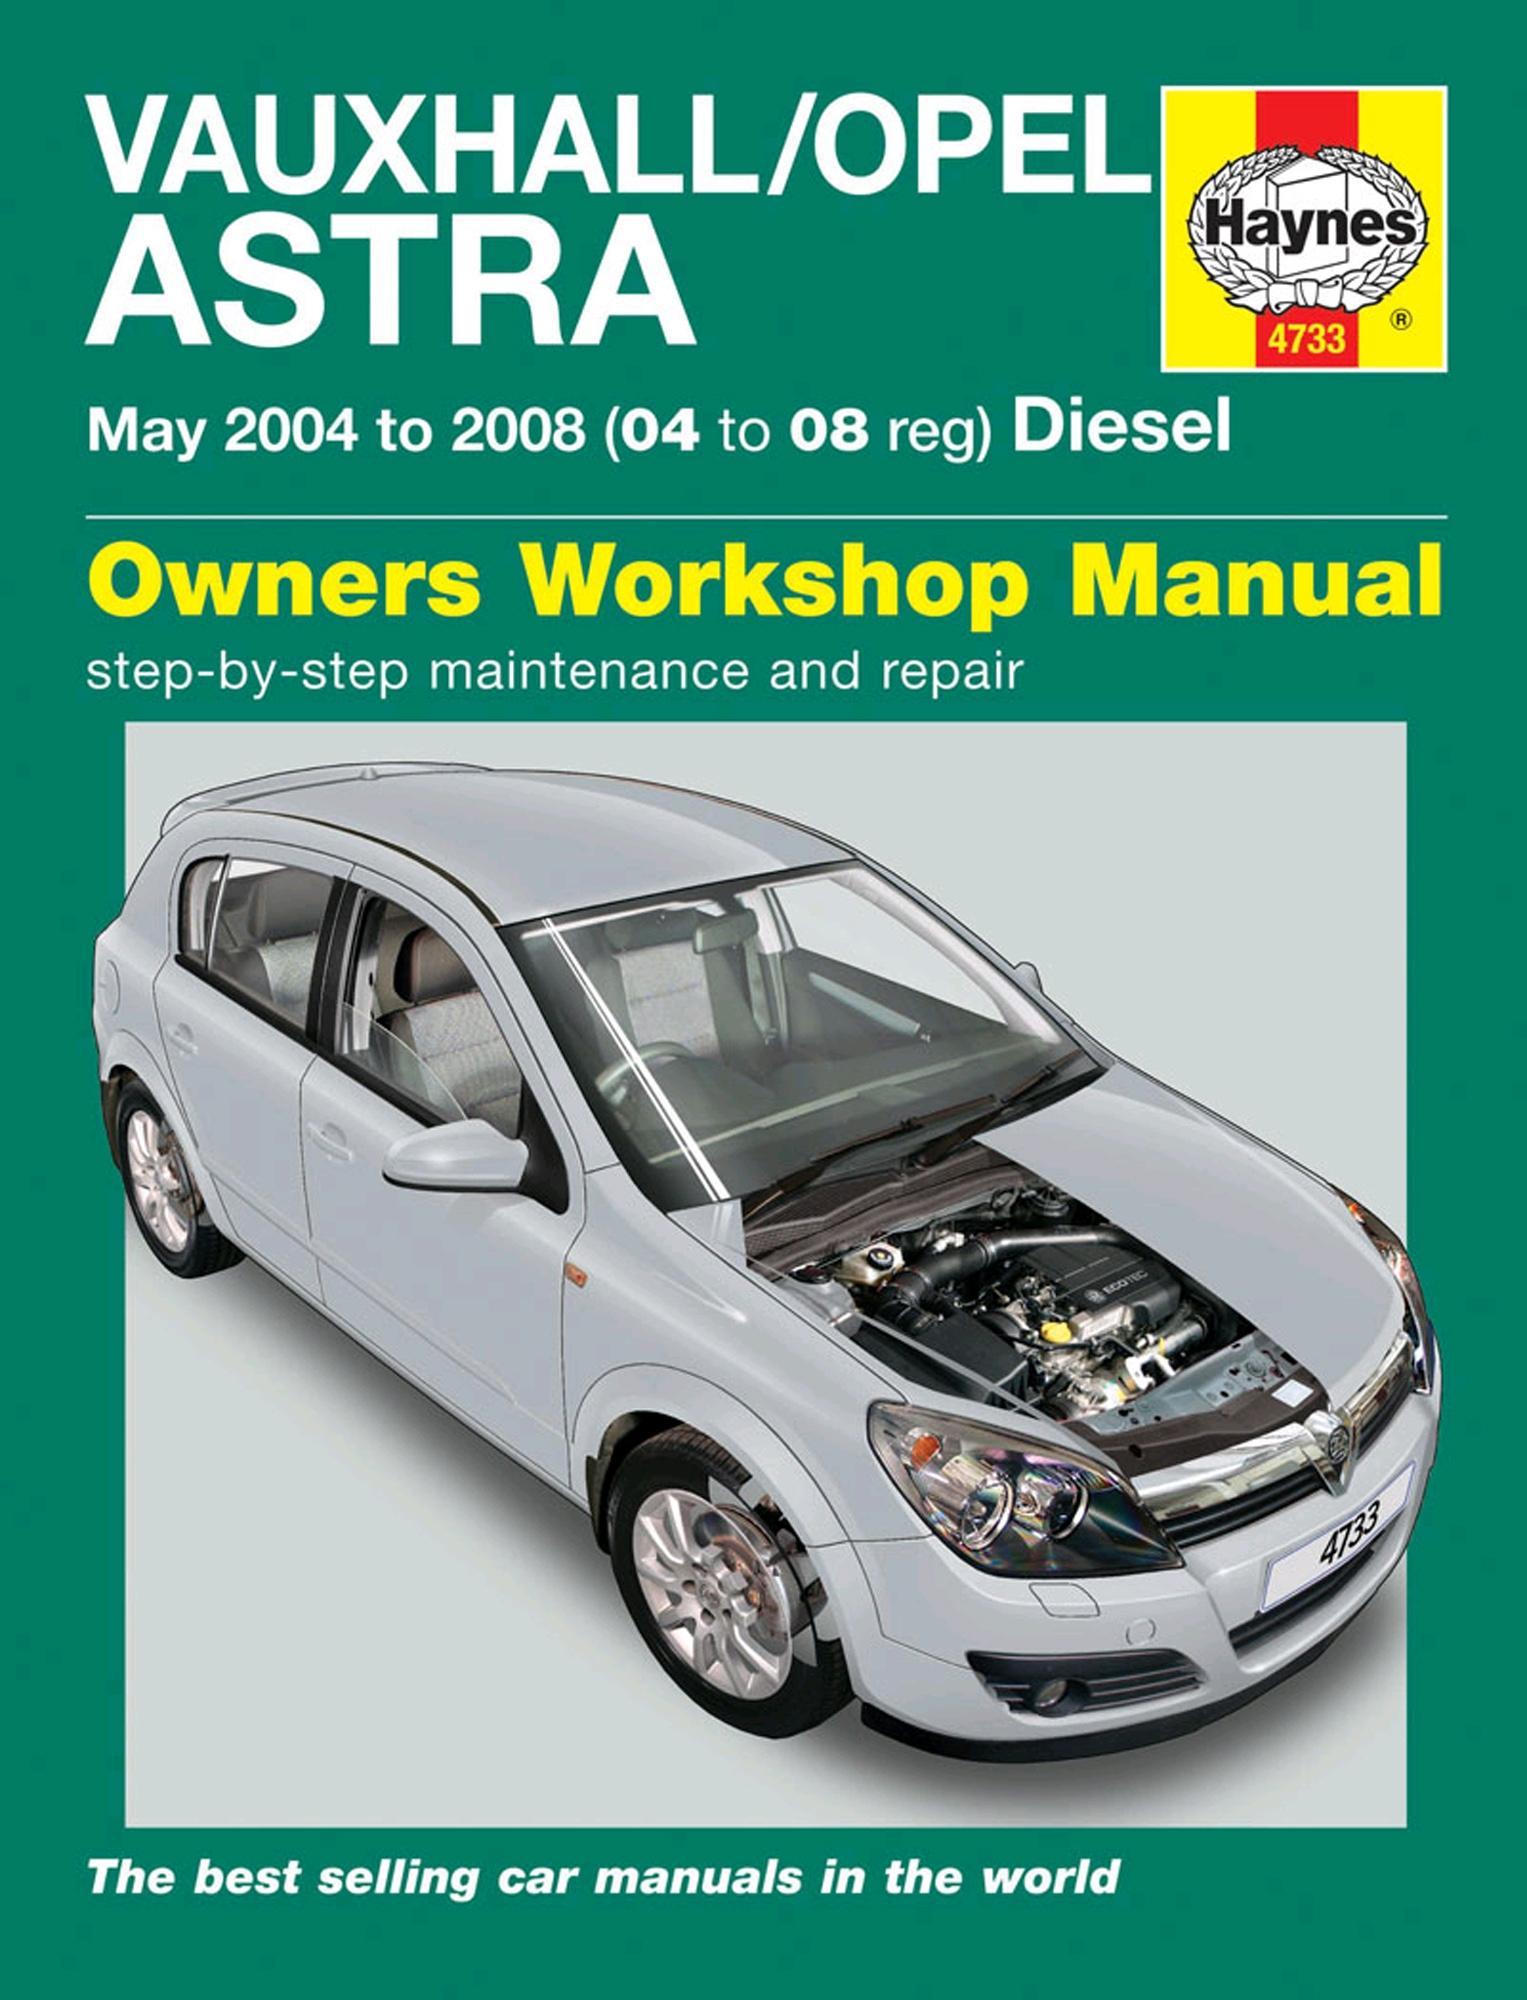 haynes manual astra twintop free owners manual u2022 rh wordworksbysea com Opel Astra 2015 Opel Astra 2013